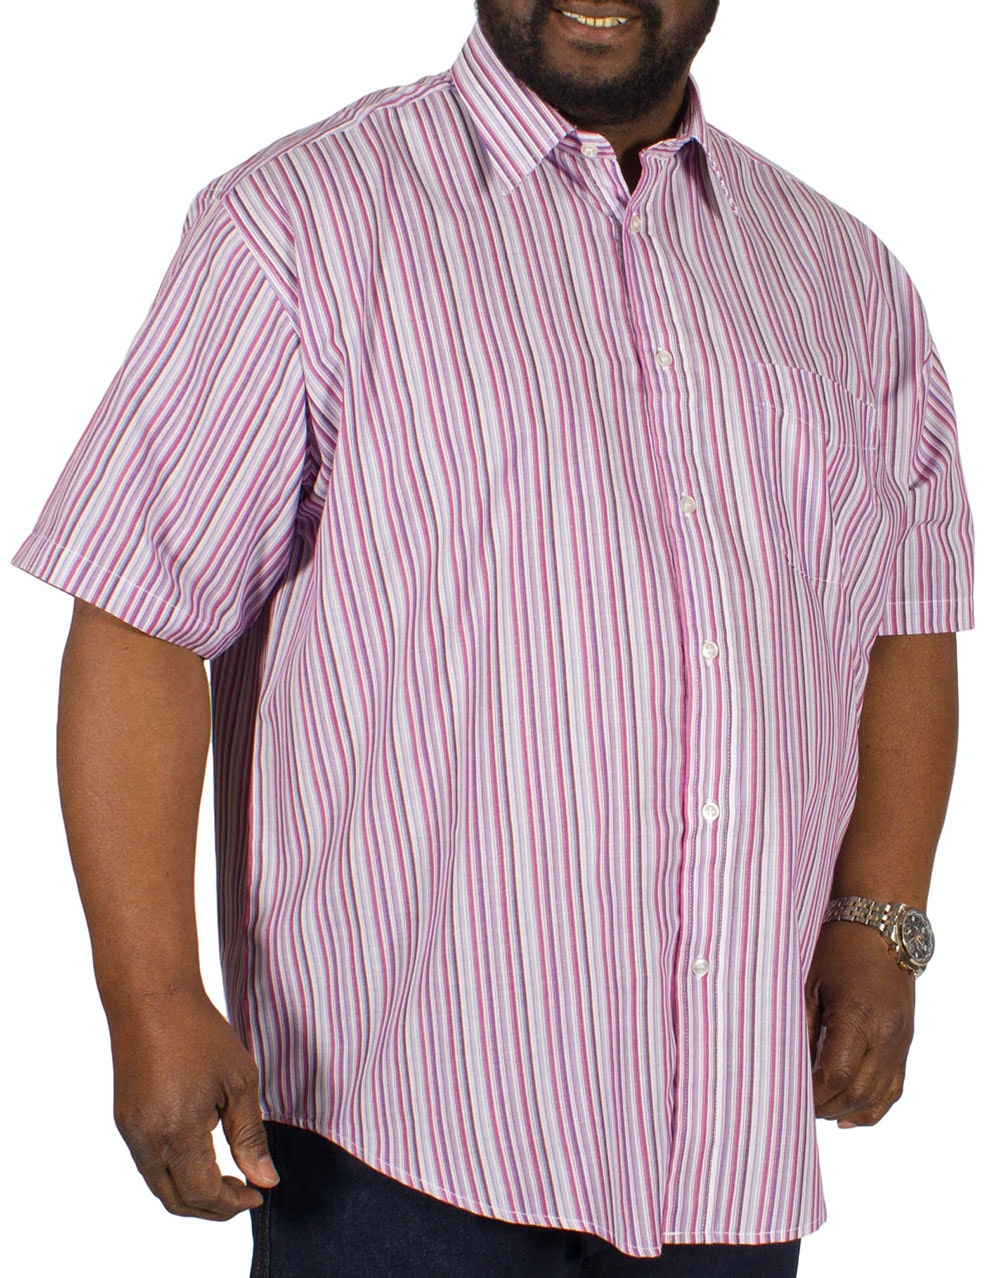 Metaphor Short Sleeve Multi Stripe Shirt Wine